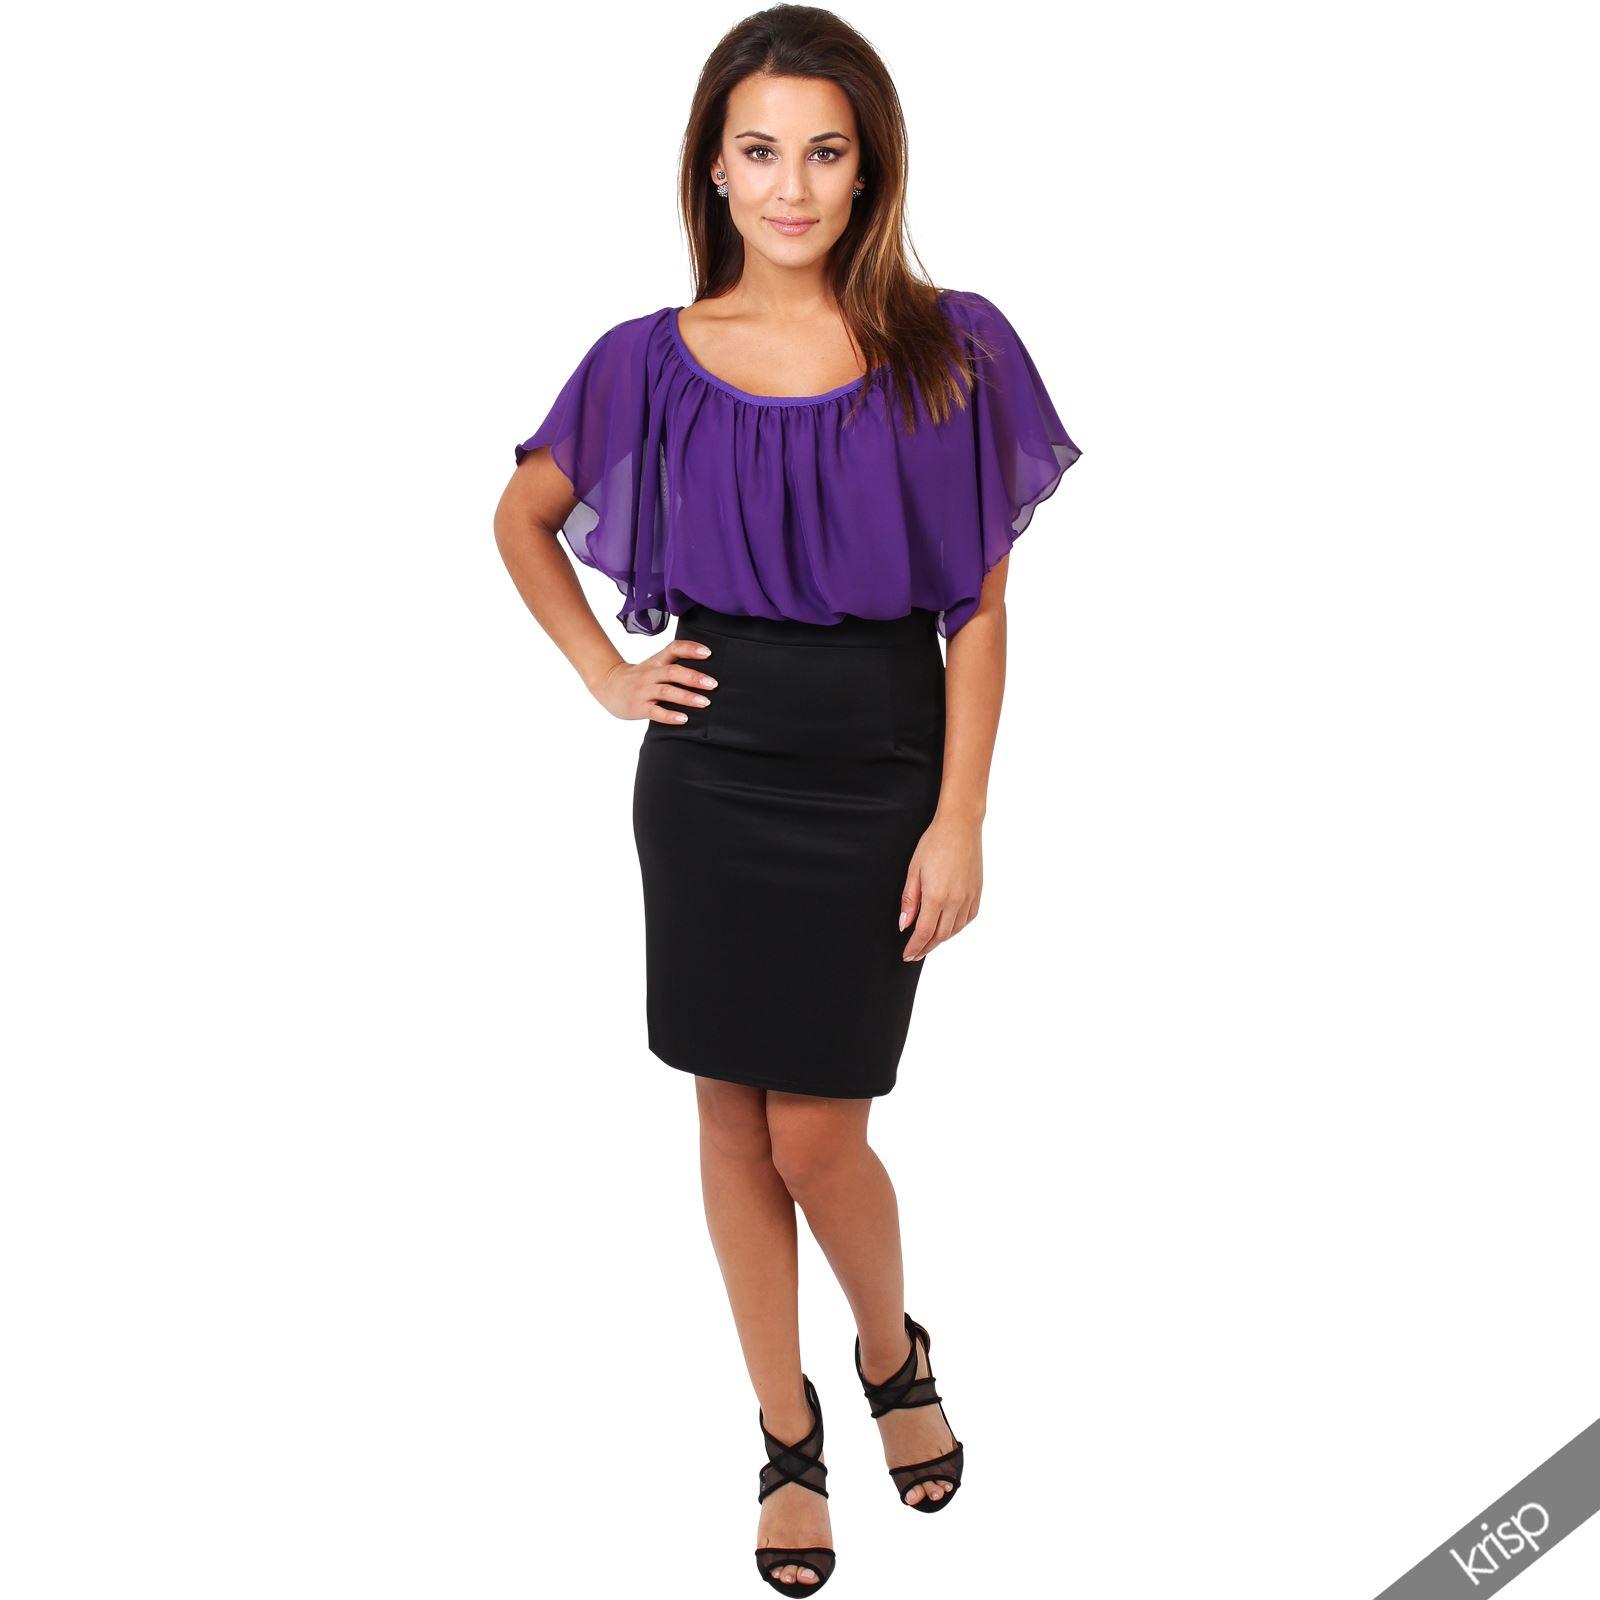 Womens-Pleated-Chiffon-Batwing-Top-High-Waist-Pencil-Bodycon-Skirt-Mini-Dress thumbnail 20